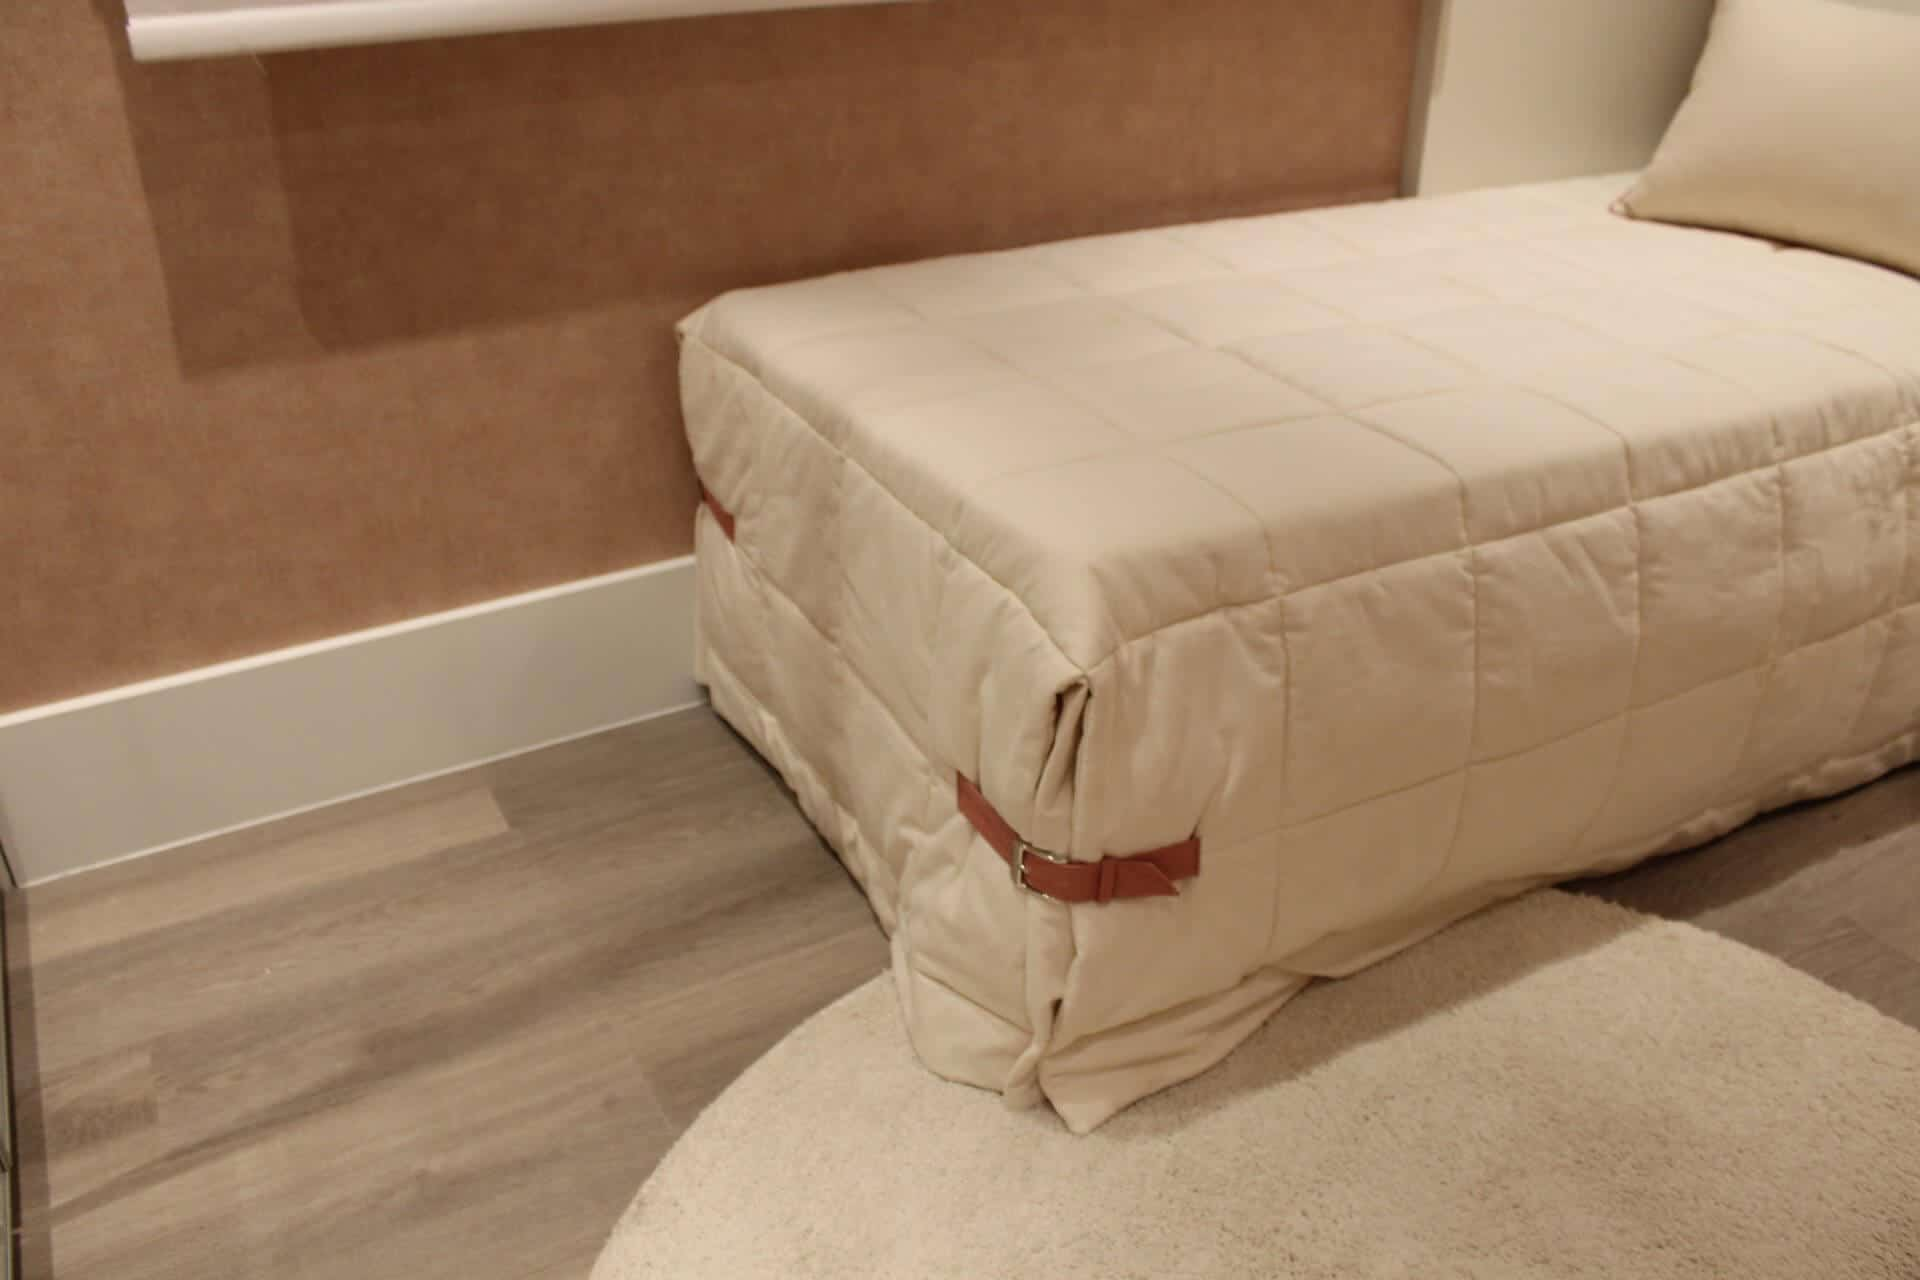 dormitorio-planejado_moveis-sob-medida-galeria-38